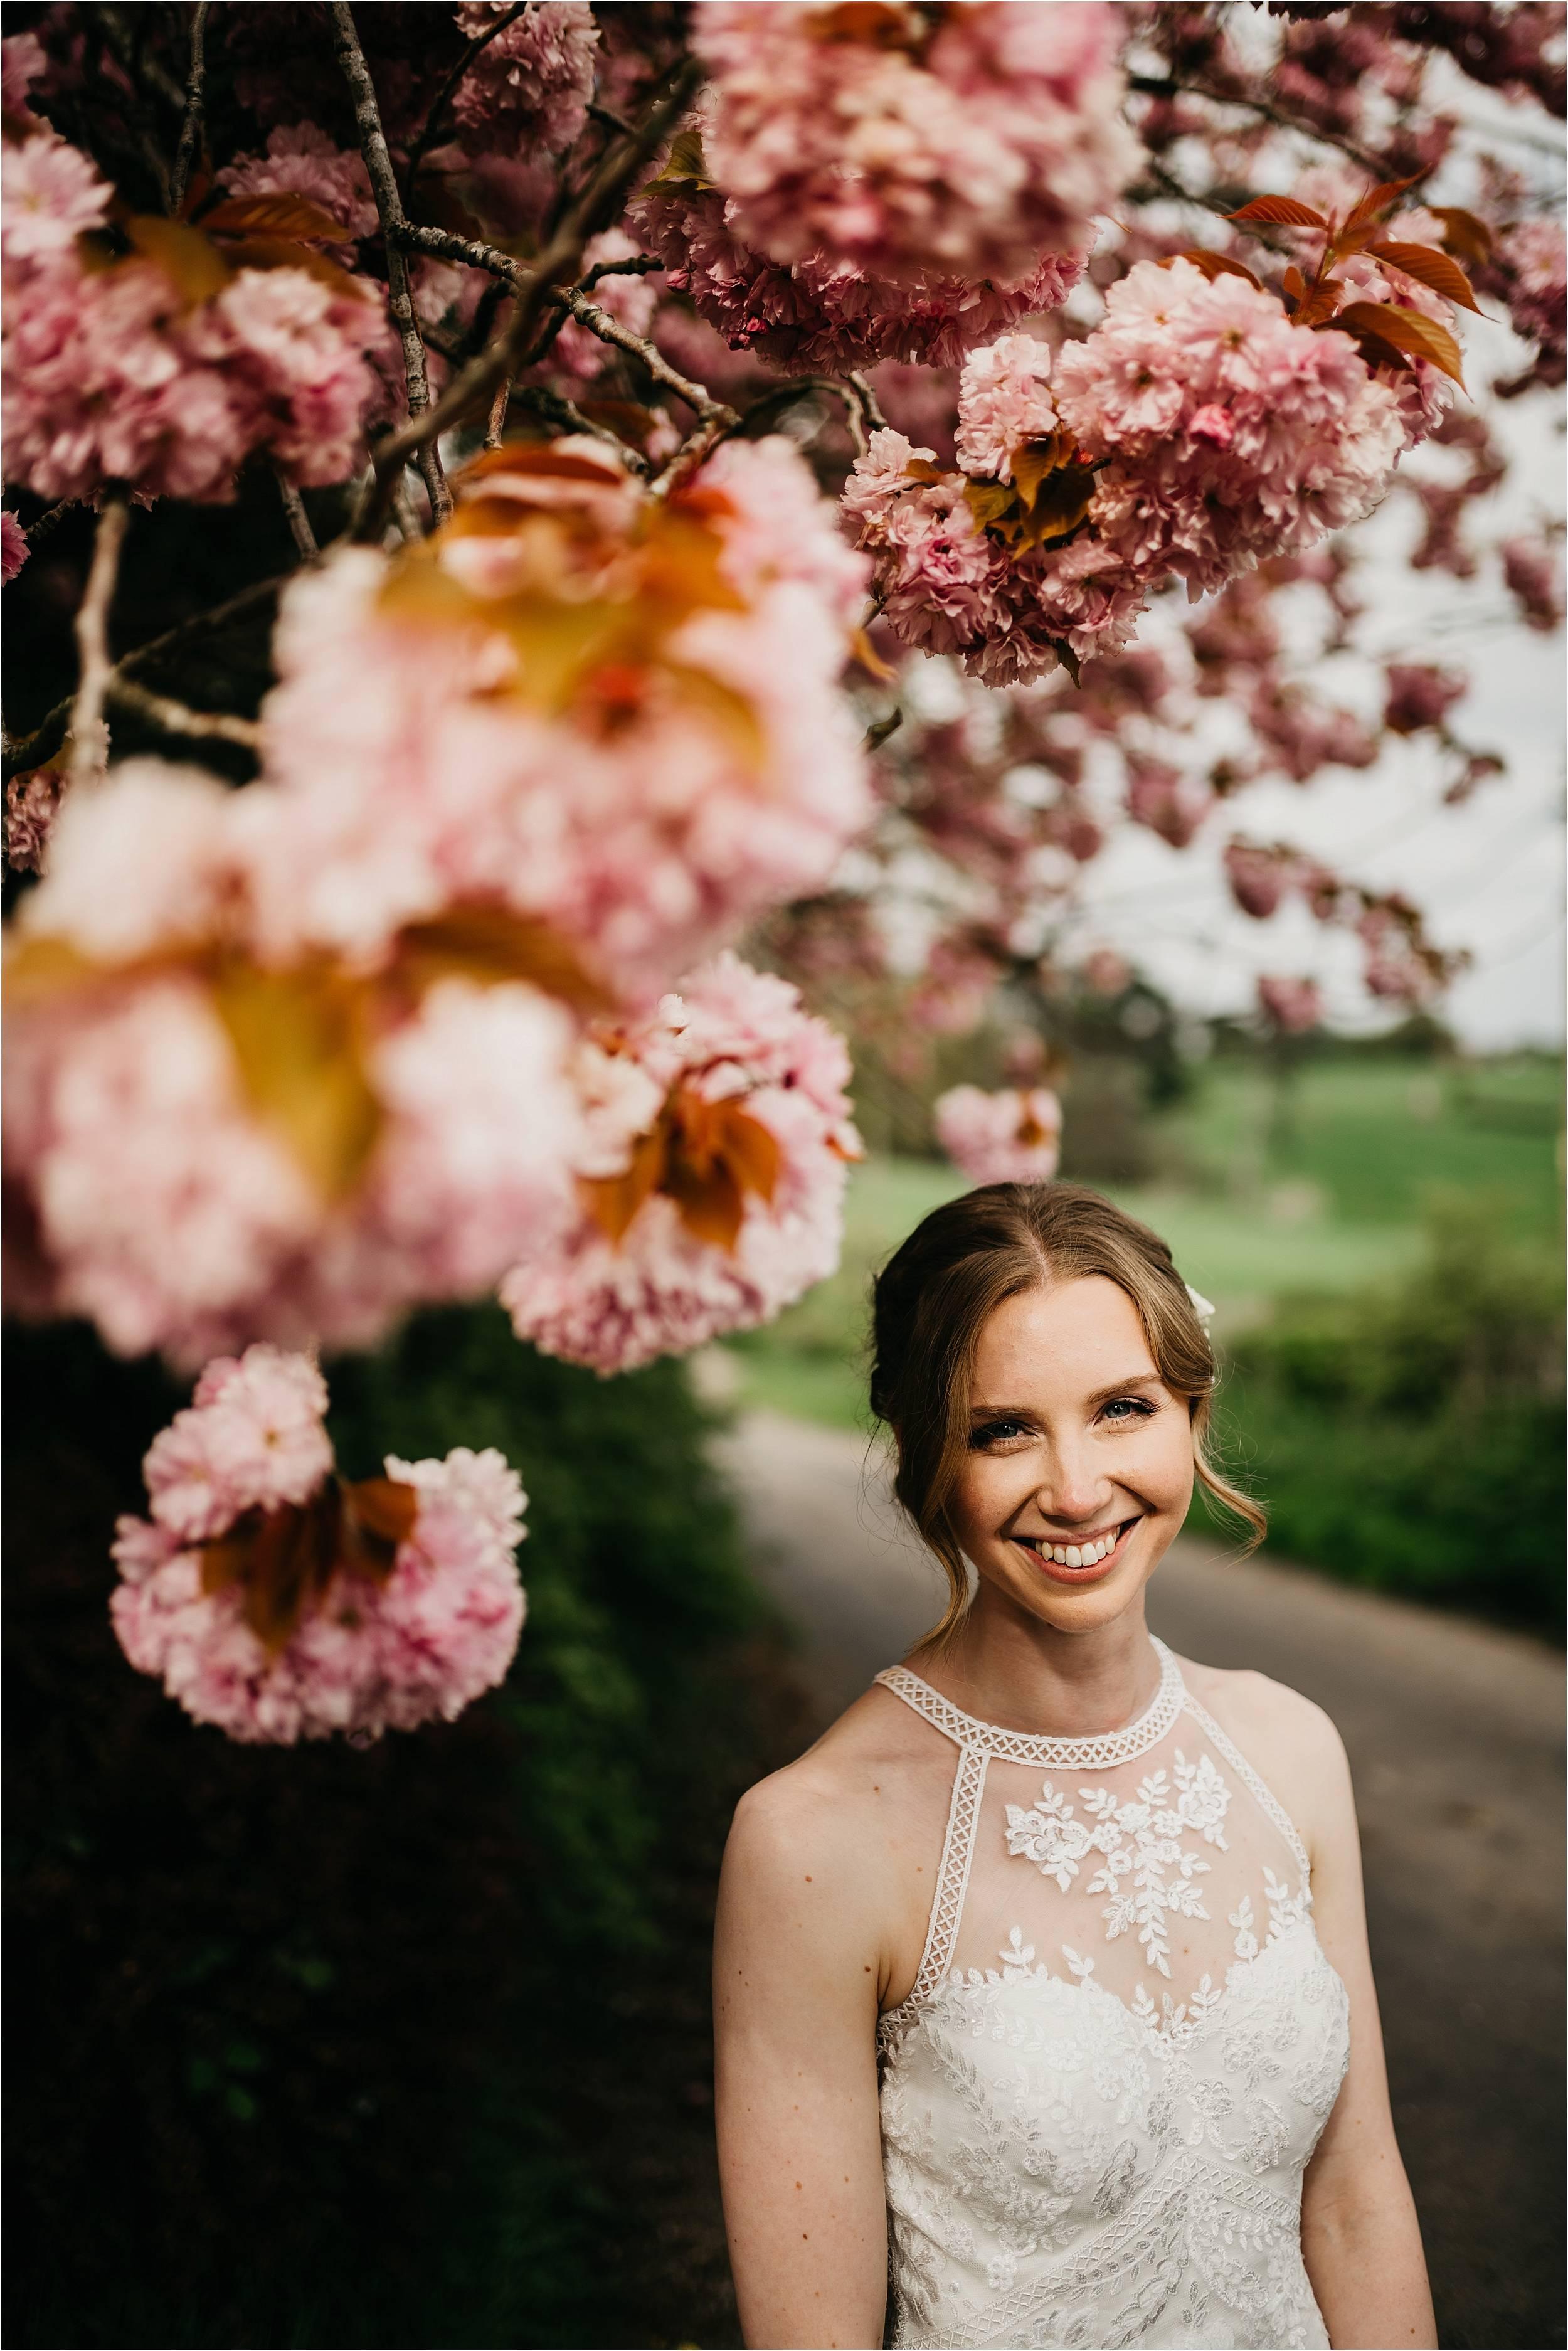 Kedleston Country House Wedding Photography_0074.jpg